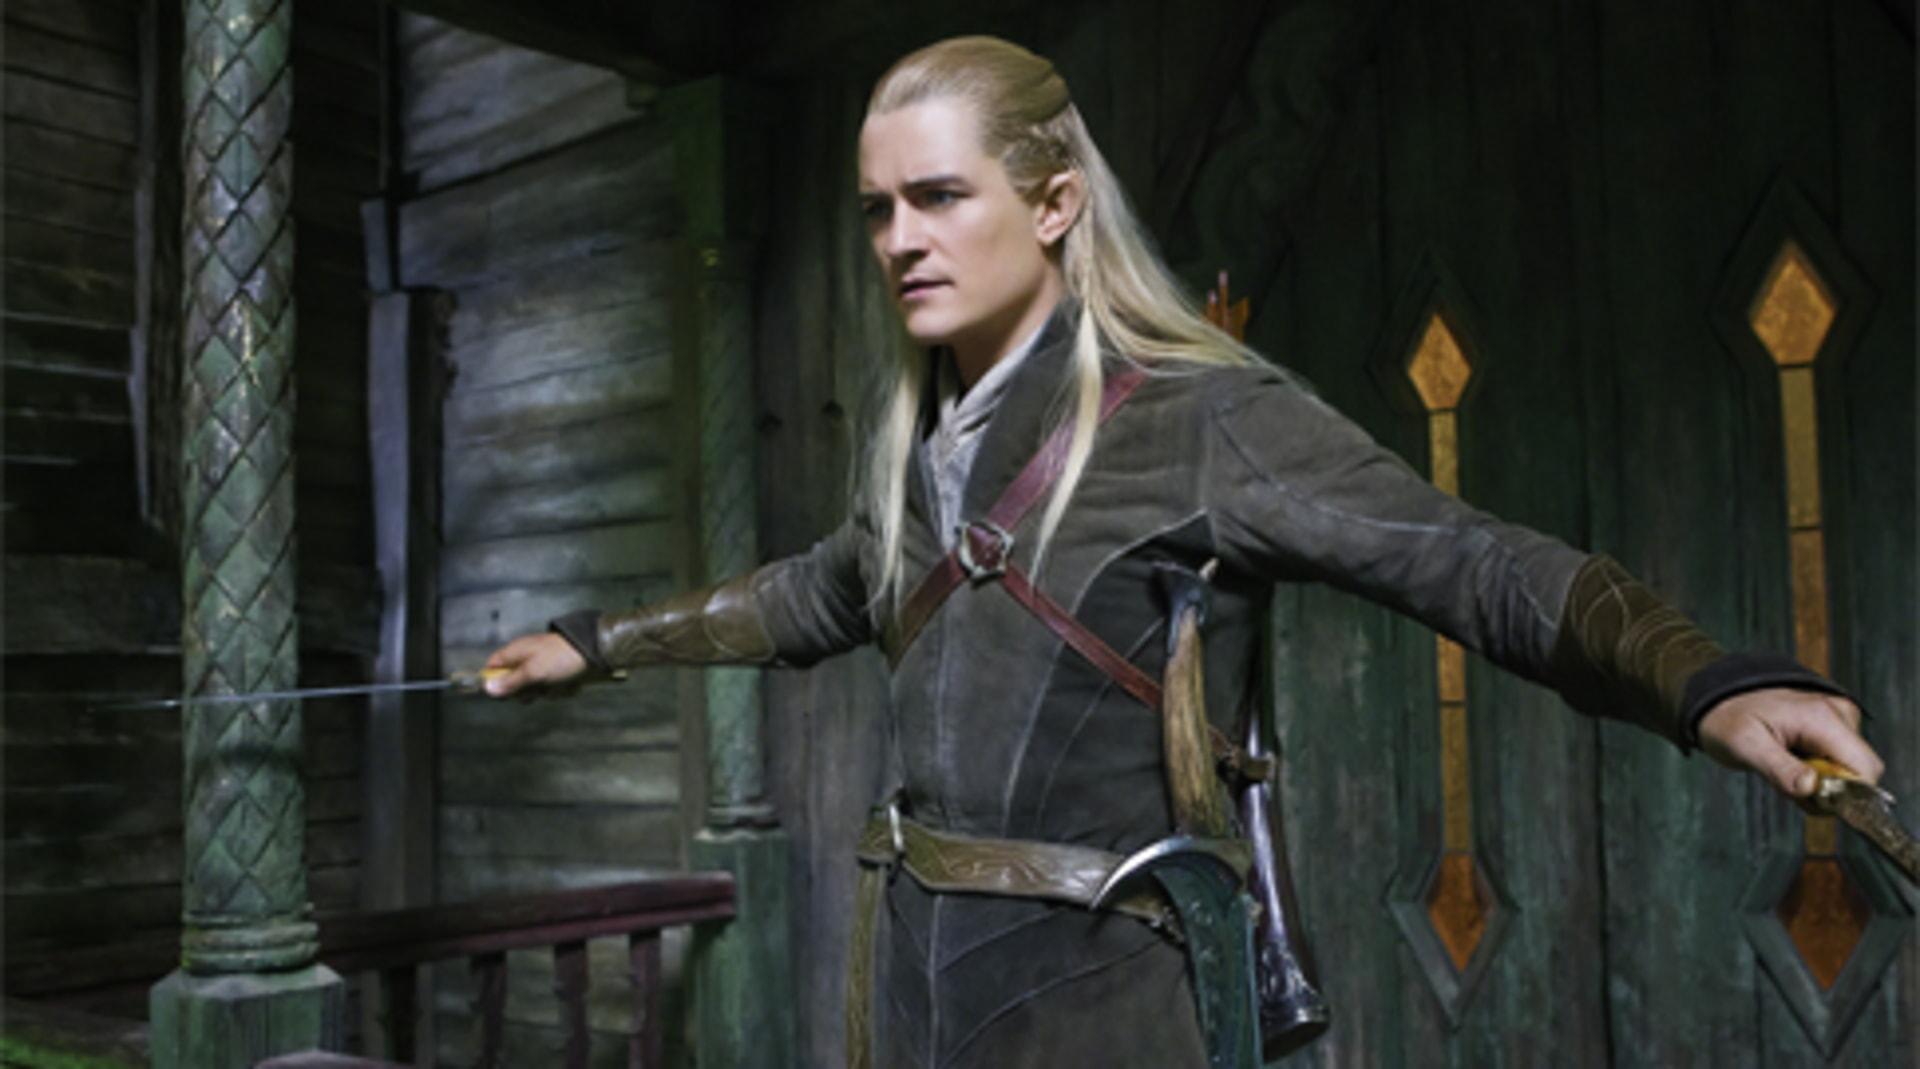 The Hobbit: The Desolation of Smaug - Image 42